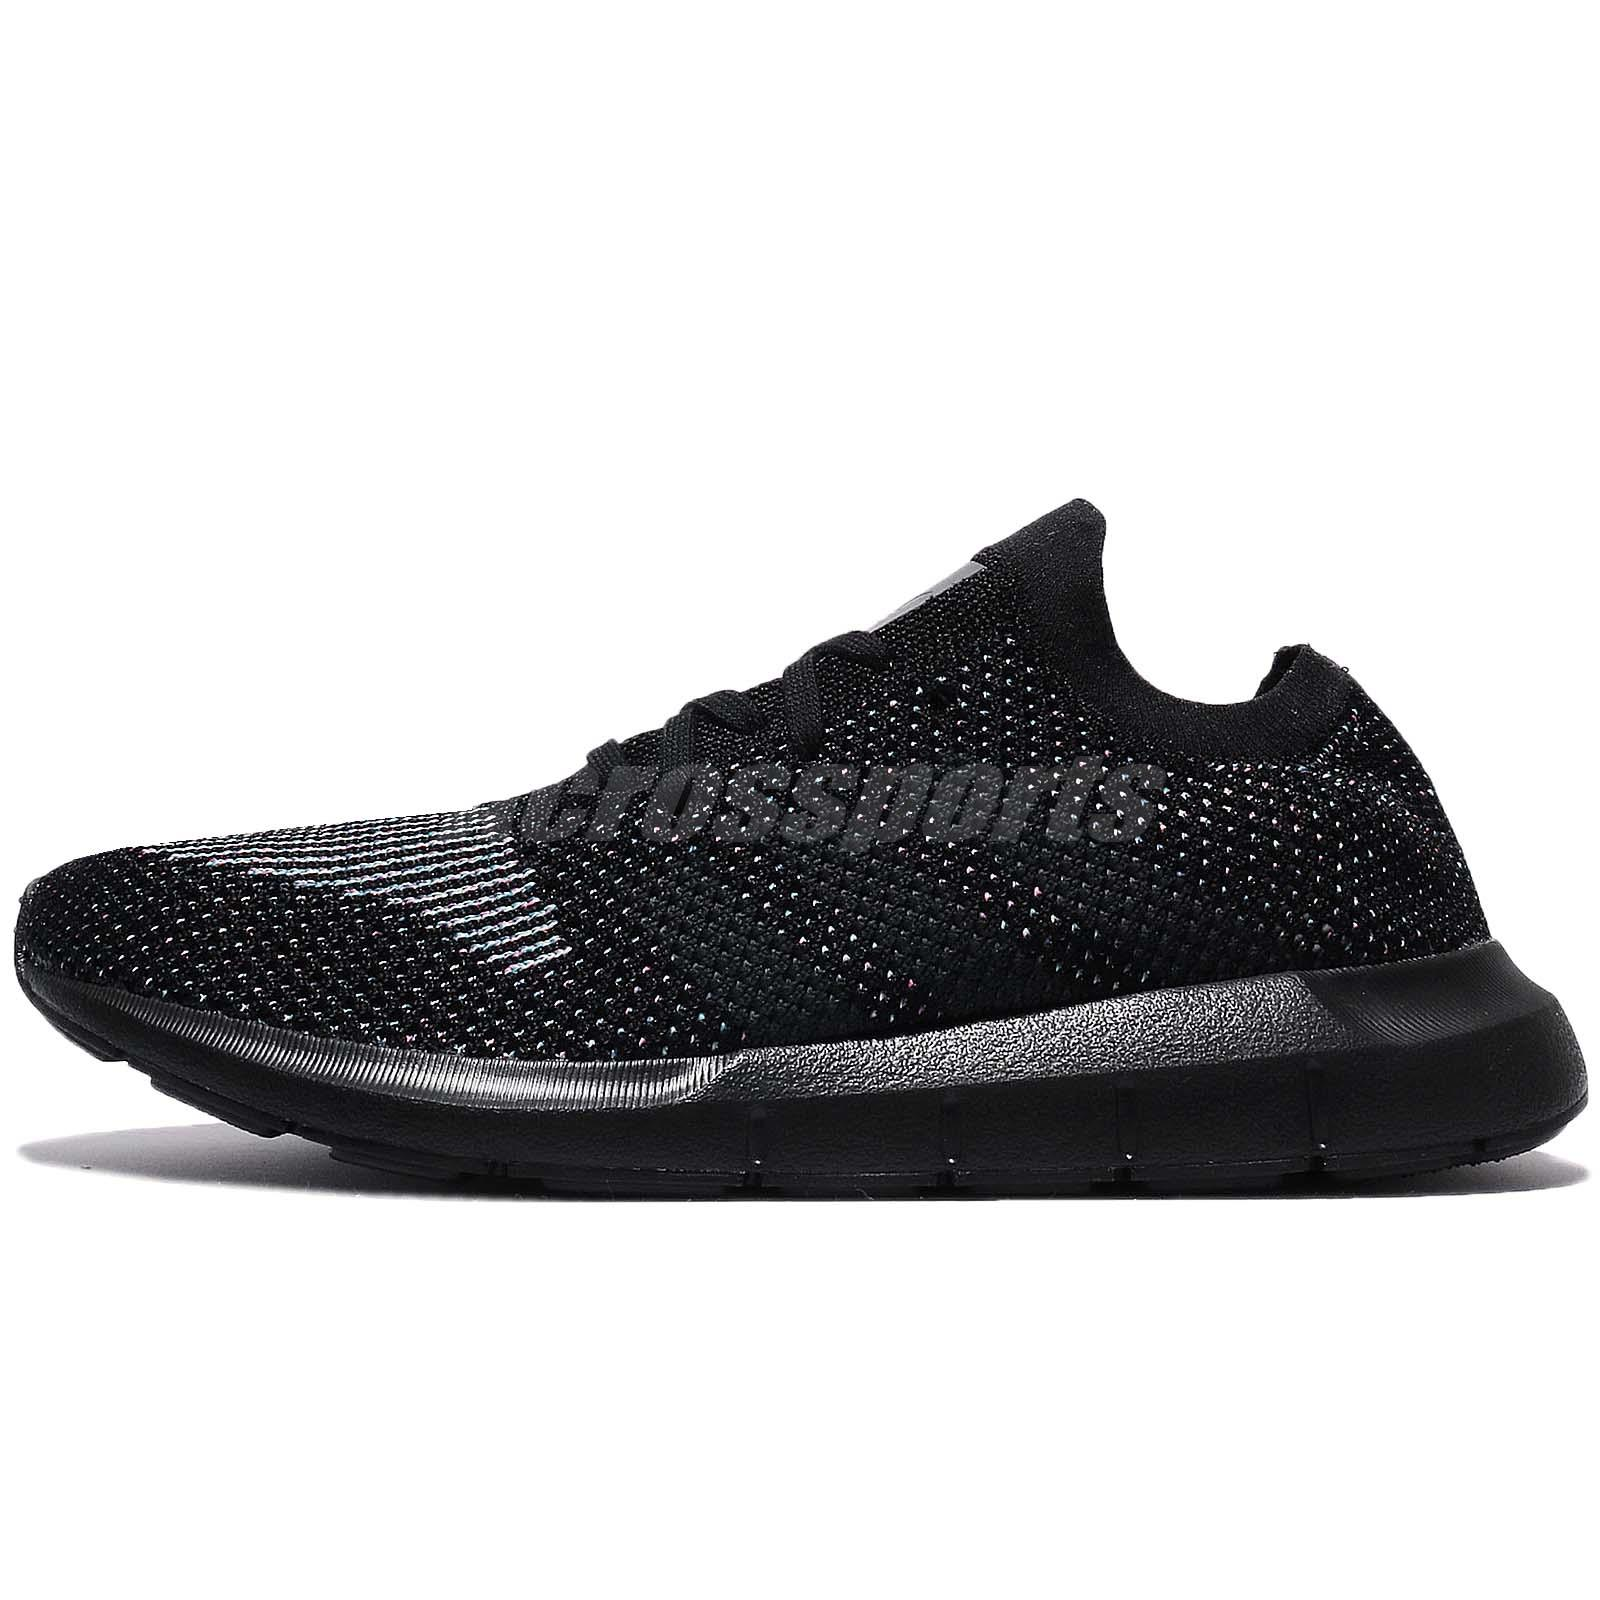 bfc14cbb9f0a adidas Originals Swift Run PK PrimeKnit Black Men Running Shoes Sneakers  CG4127